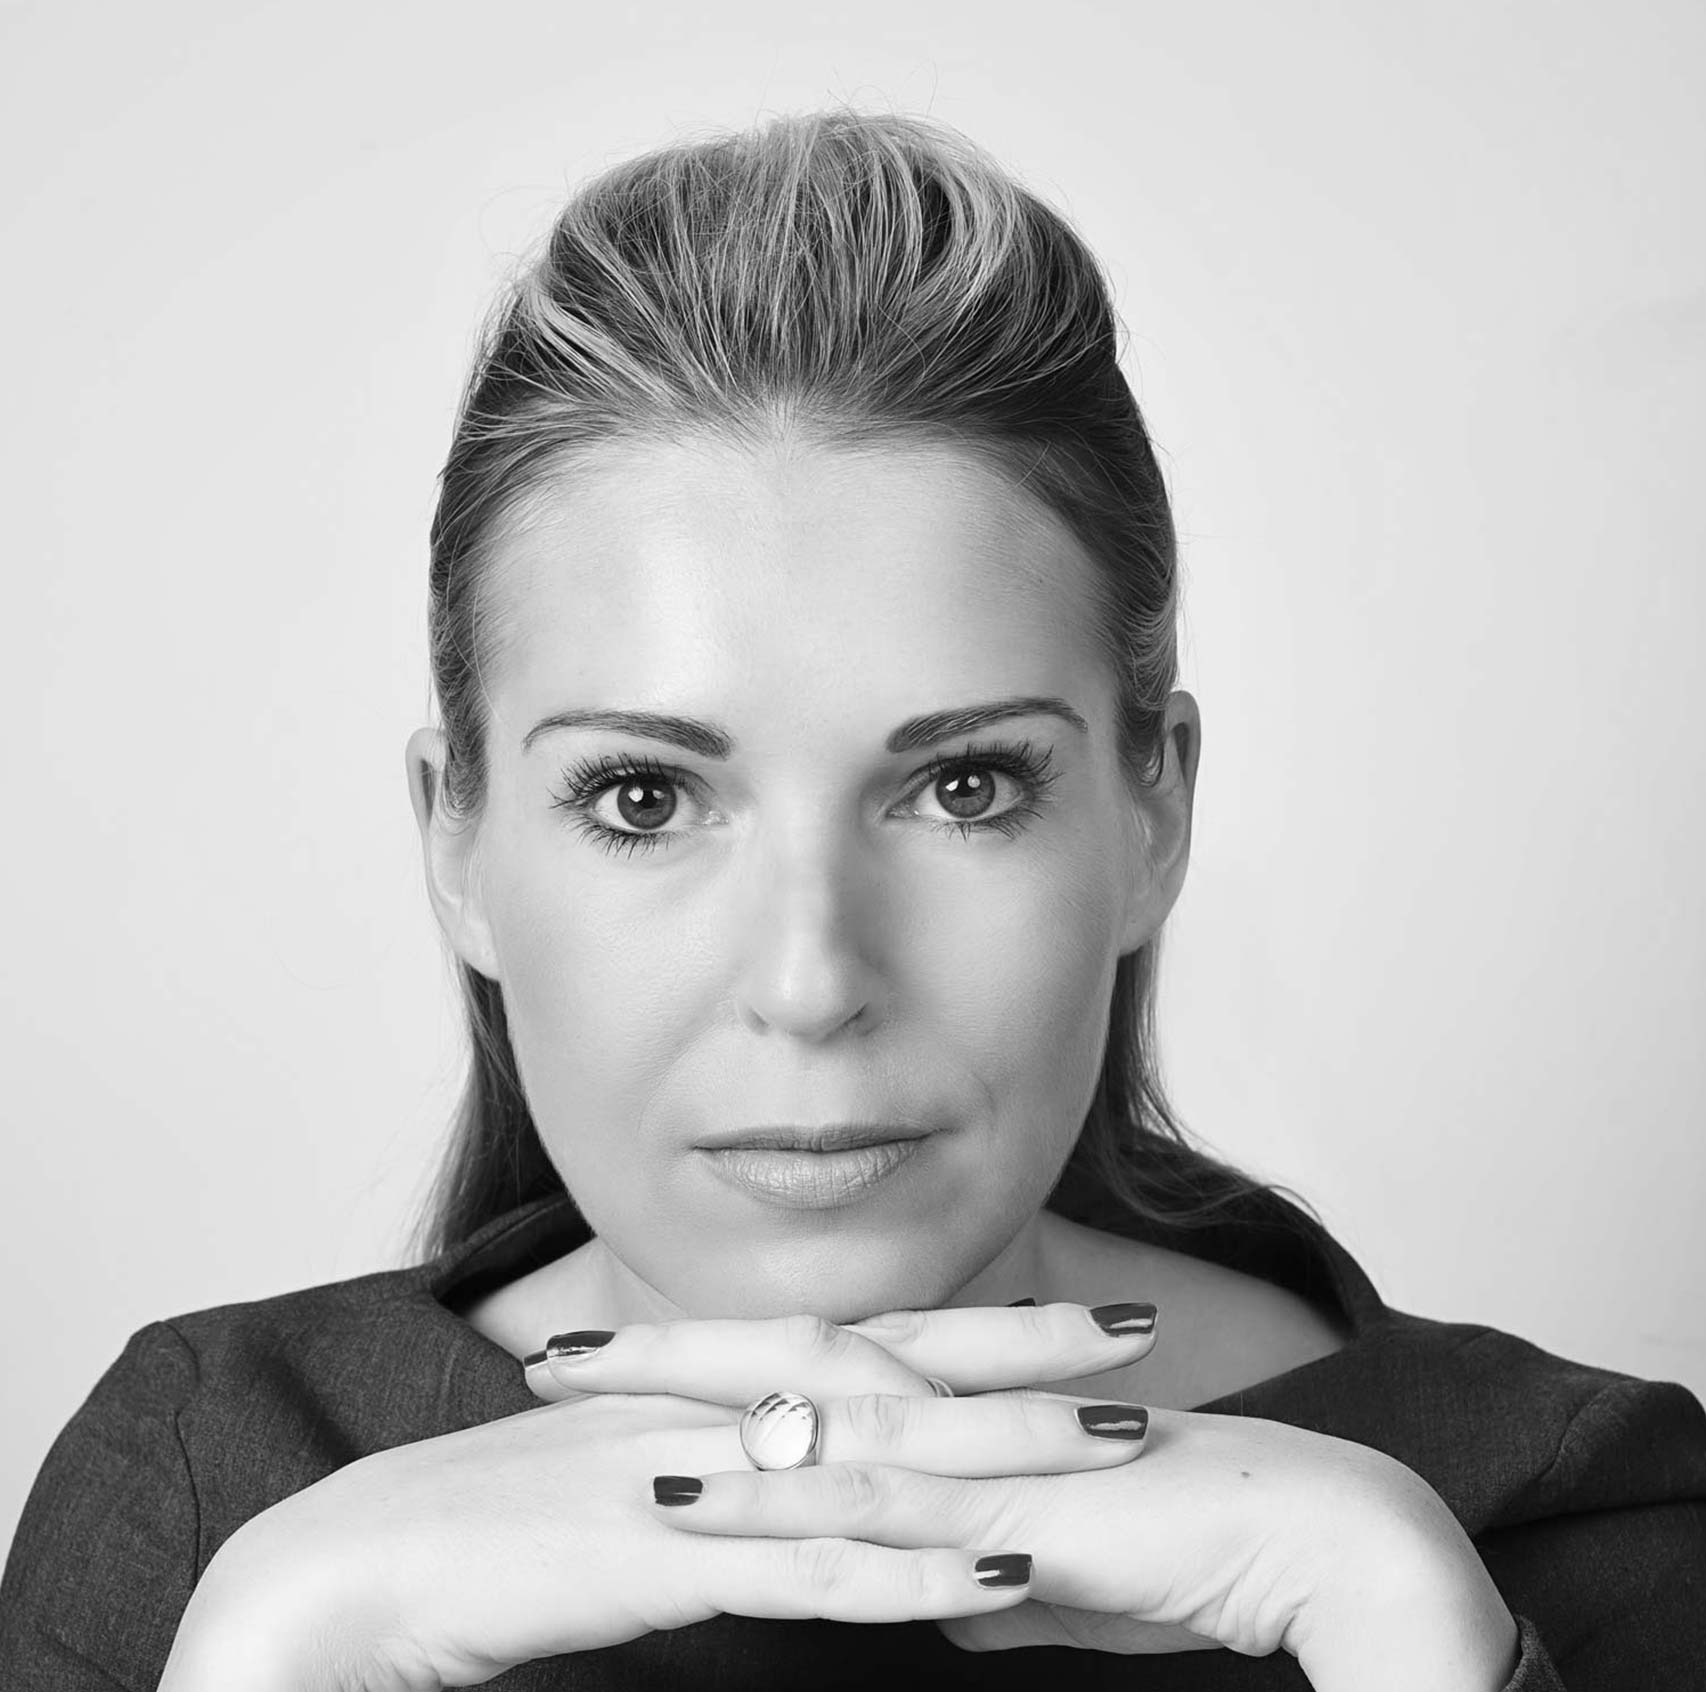 True-Creative-Agency-Business-Portrait-2-1